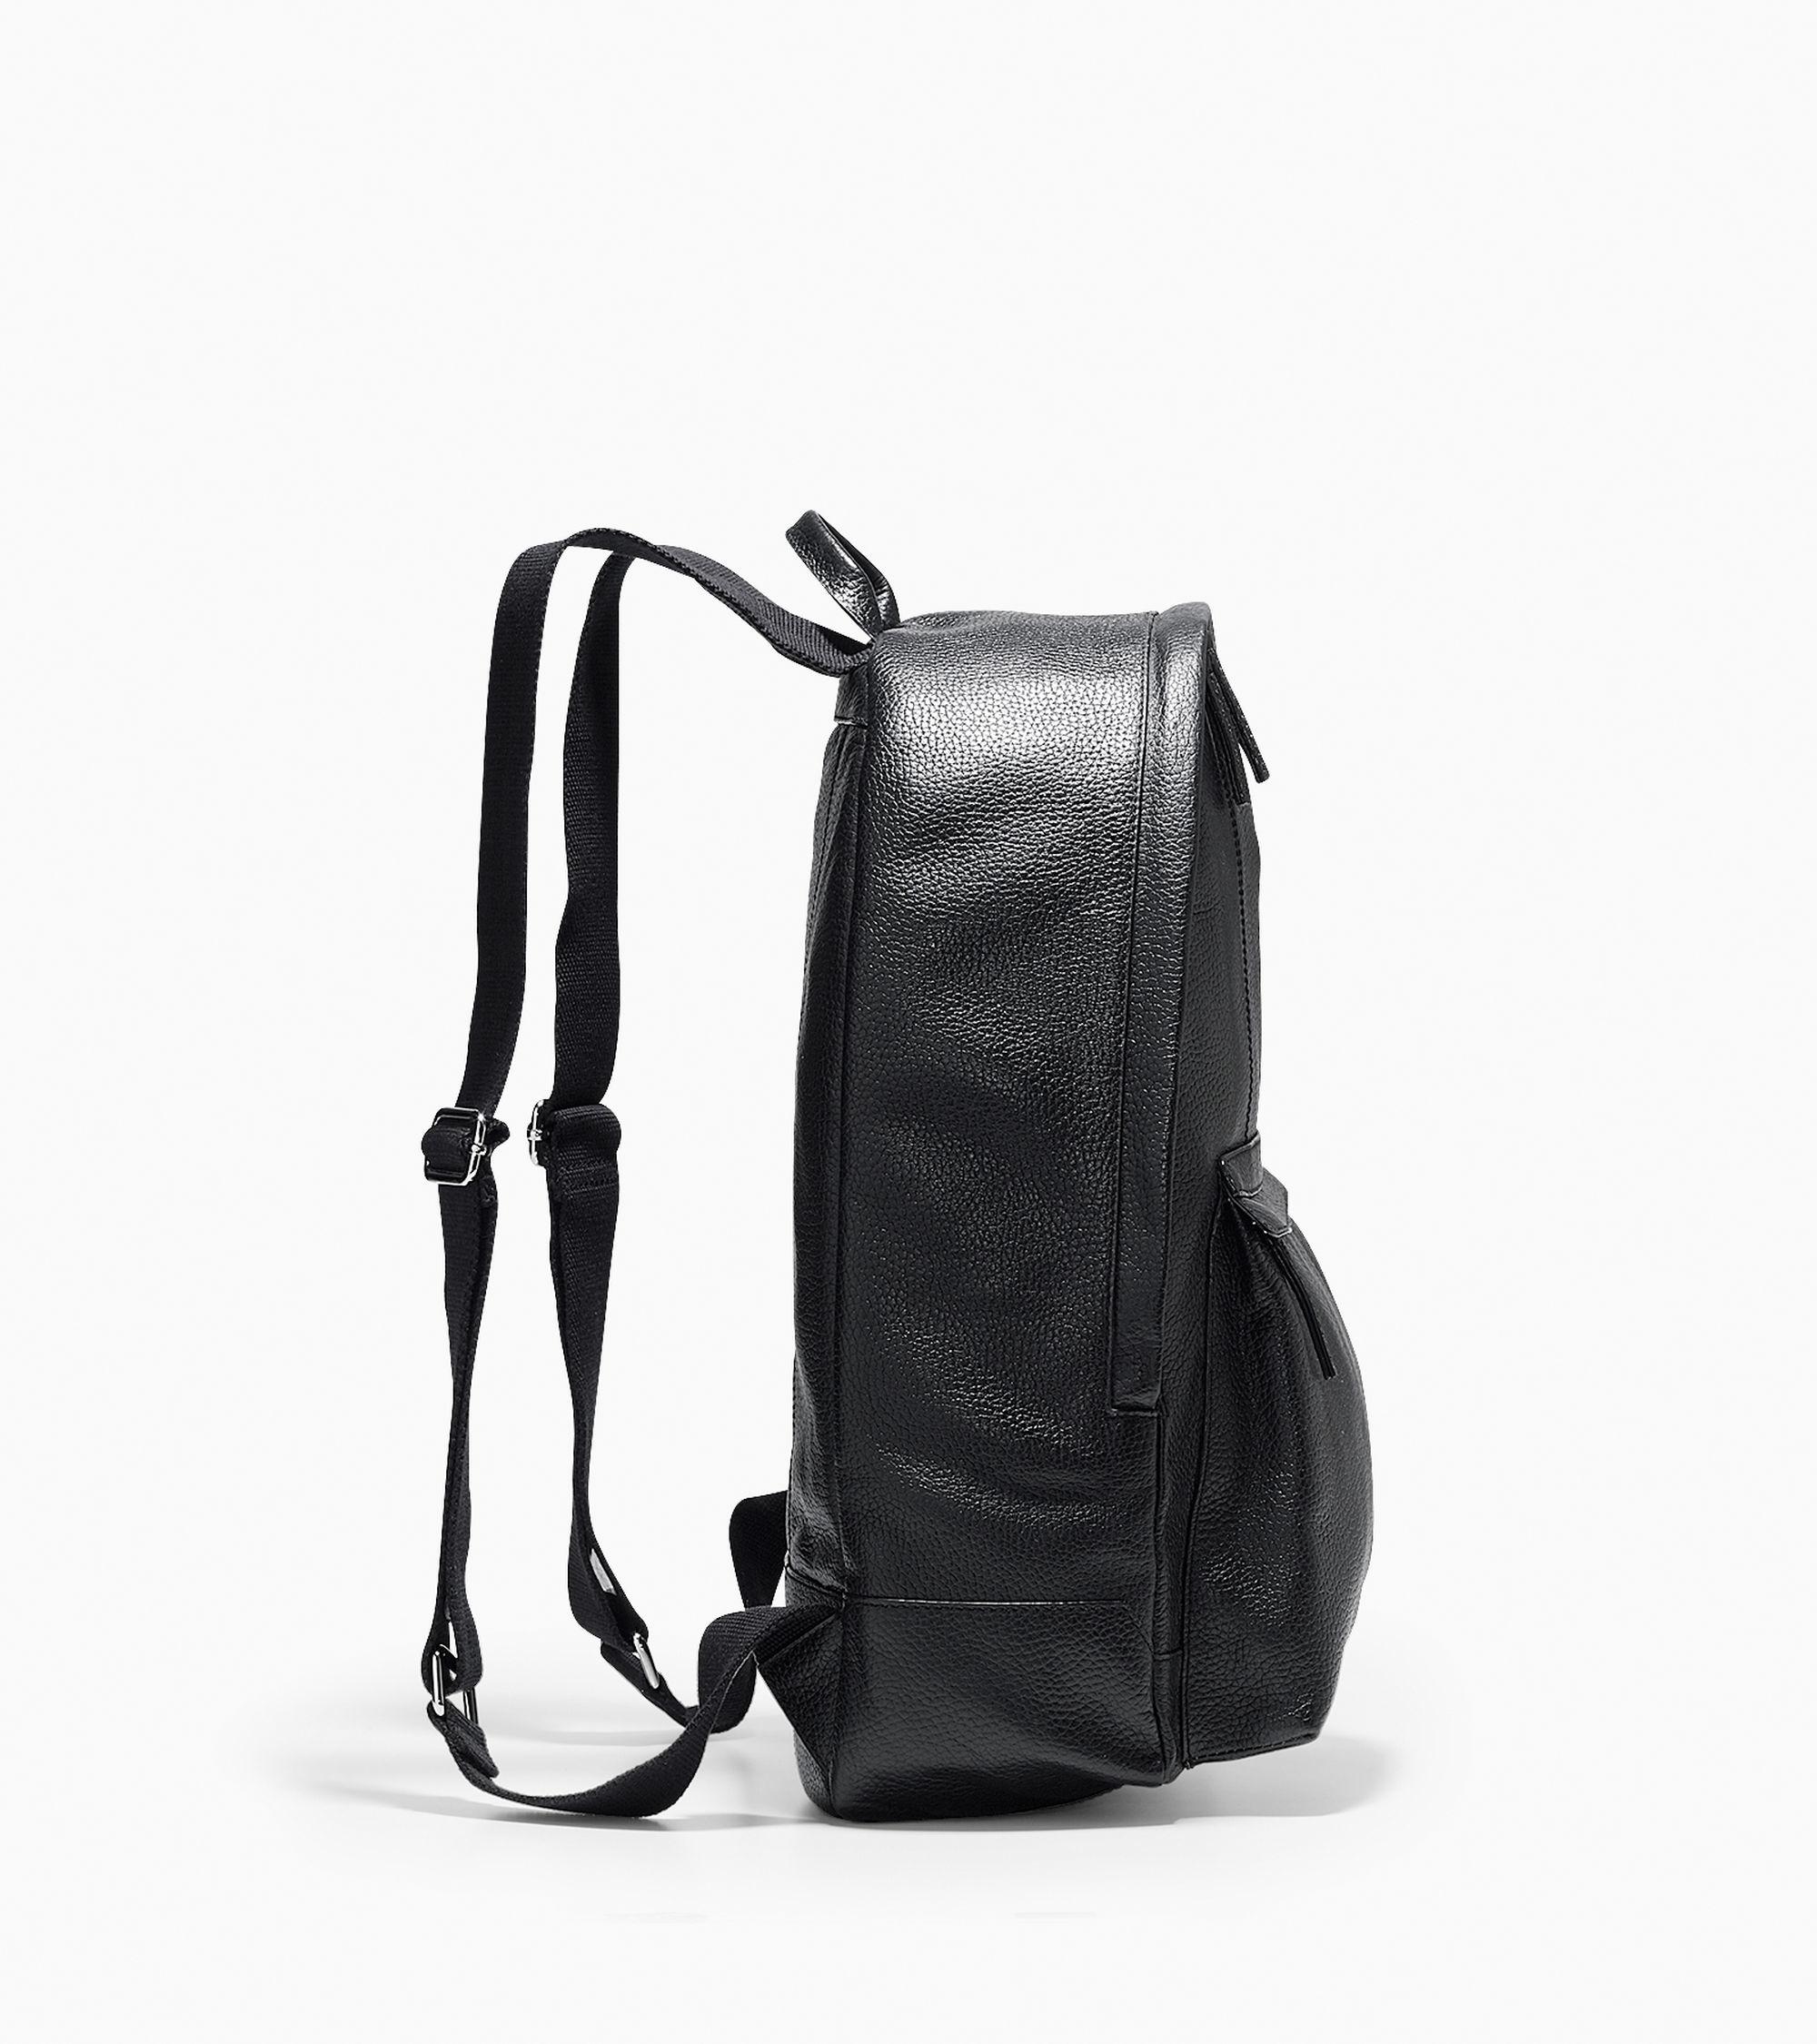 Cole haan Wayland Backpack in Black for Men